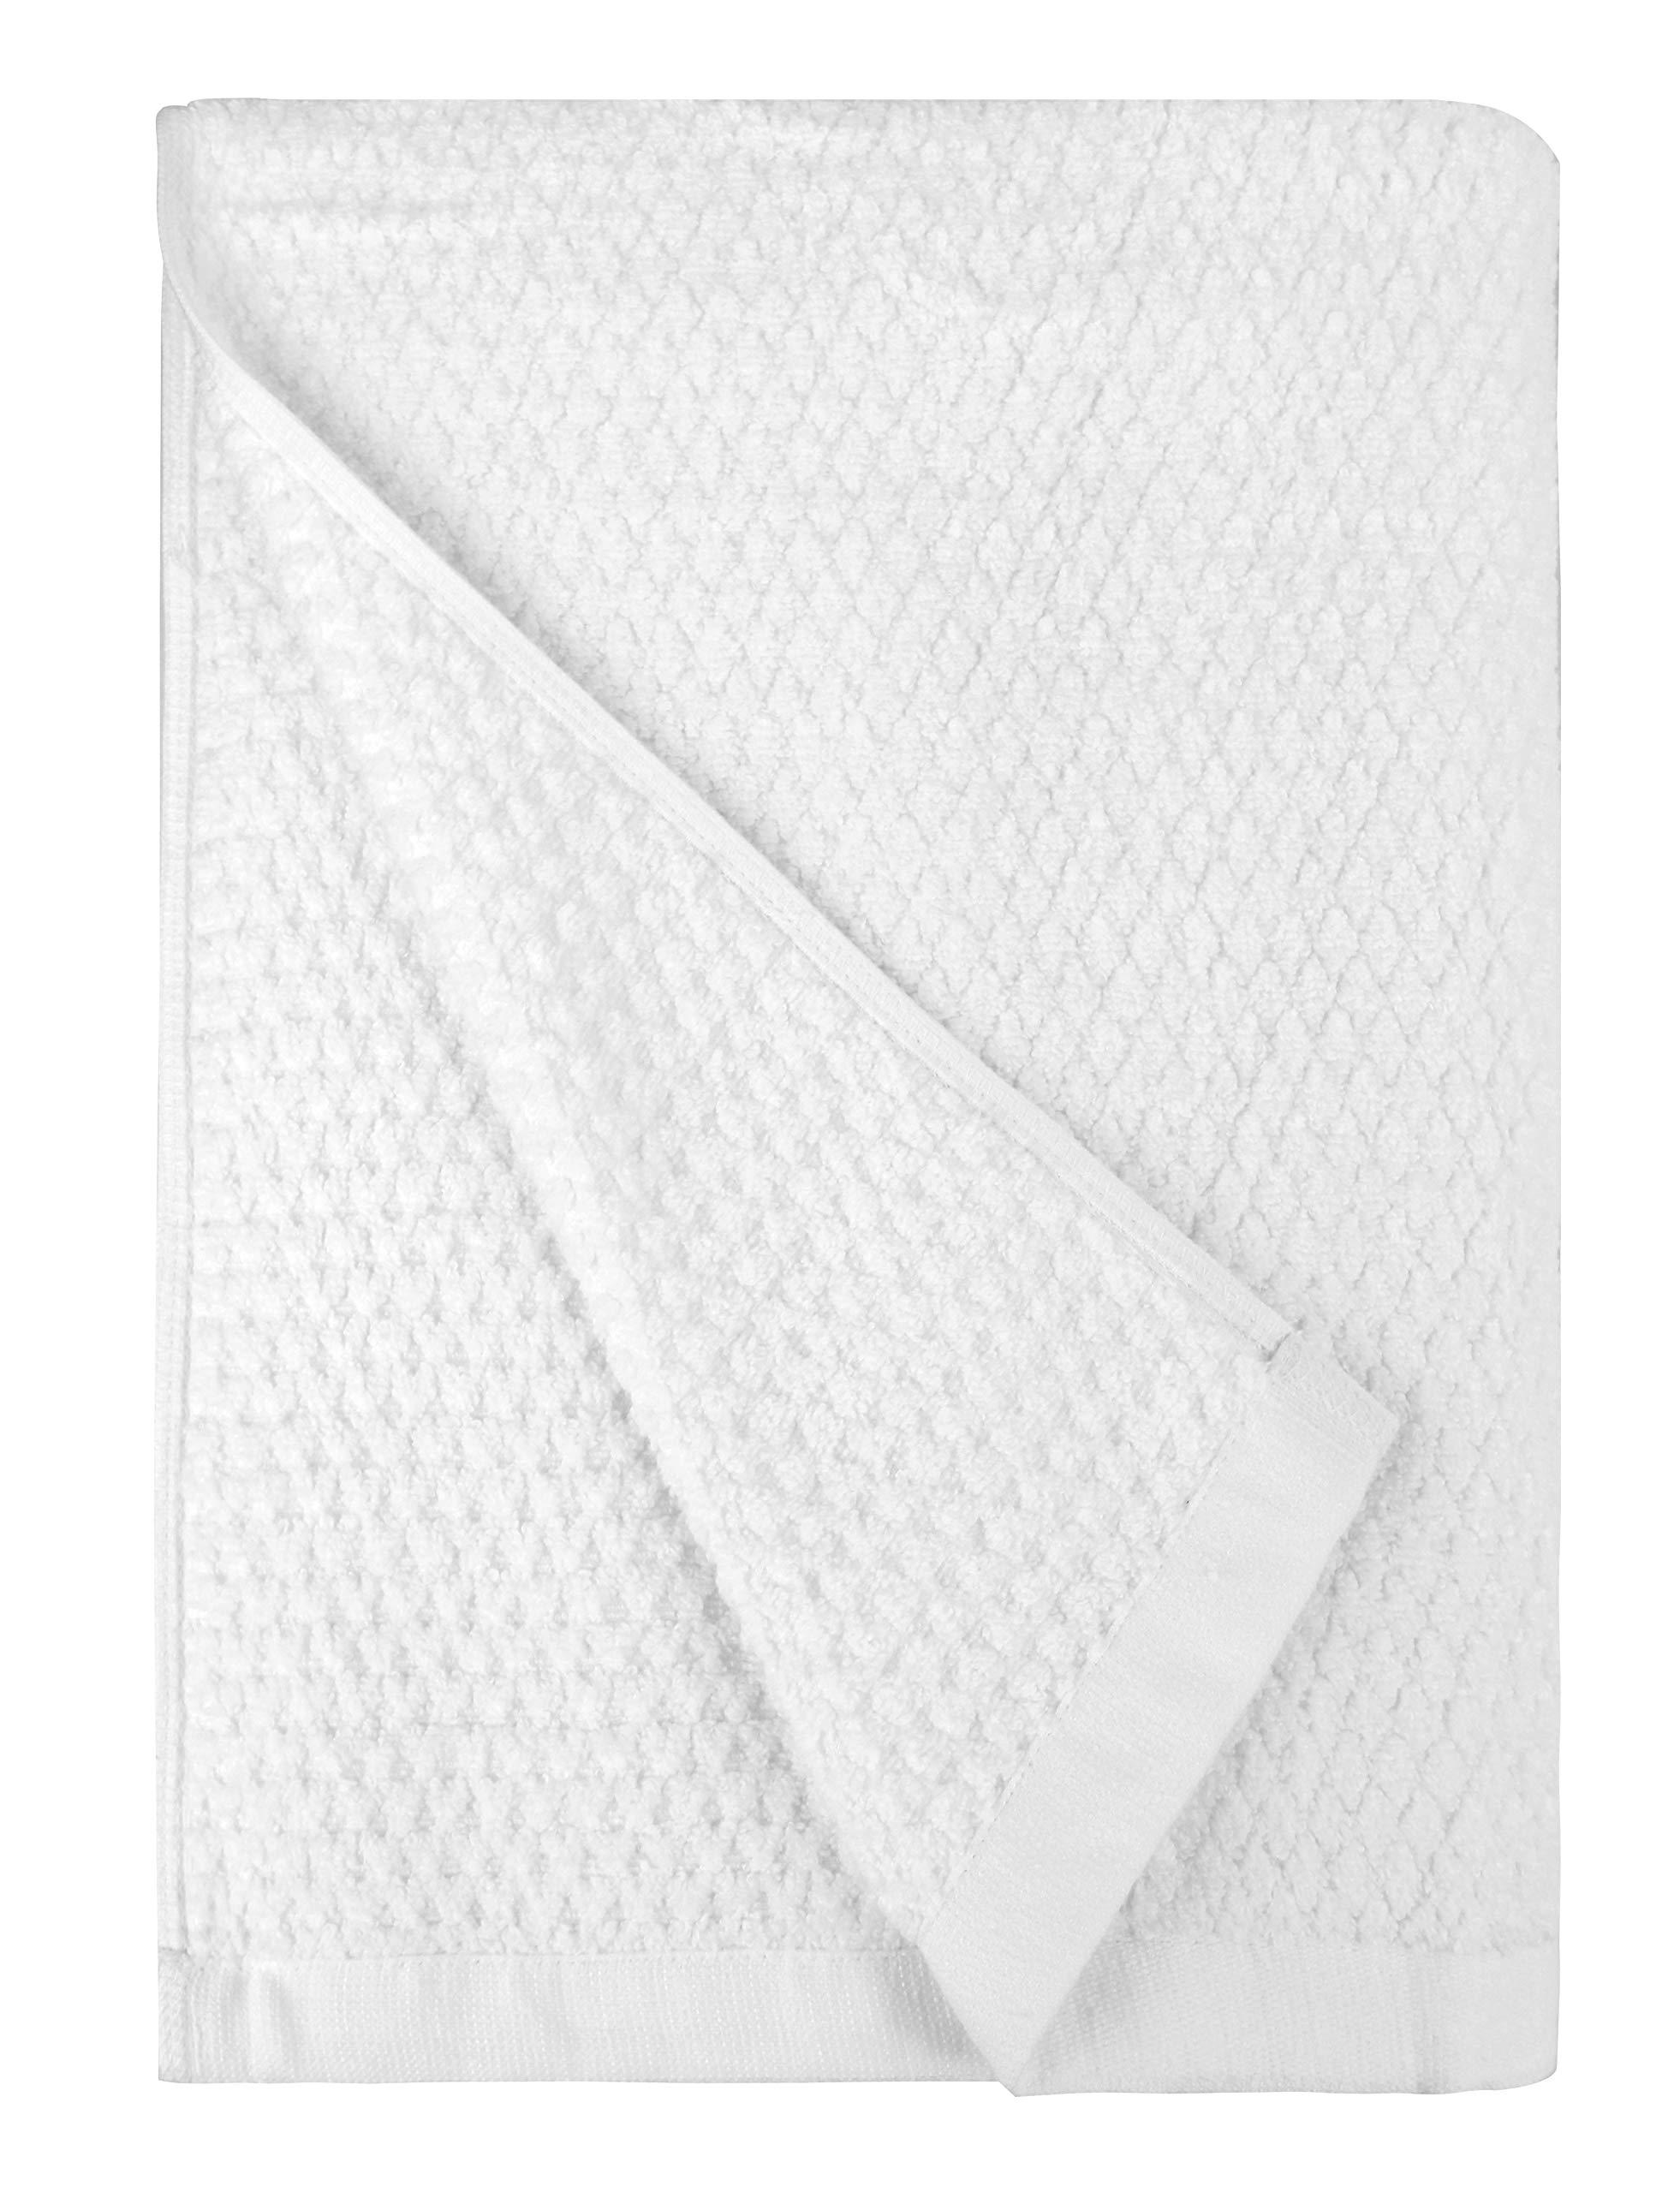 Everplush Diamond Jacquard Quick Dry Bath Towel, 1 Pack (30 x 56), White